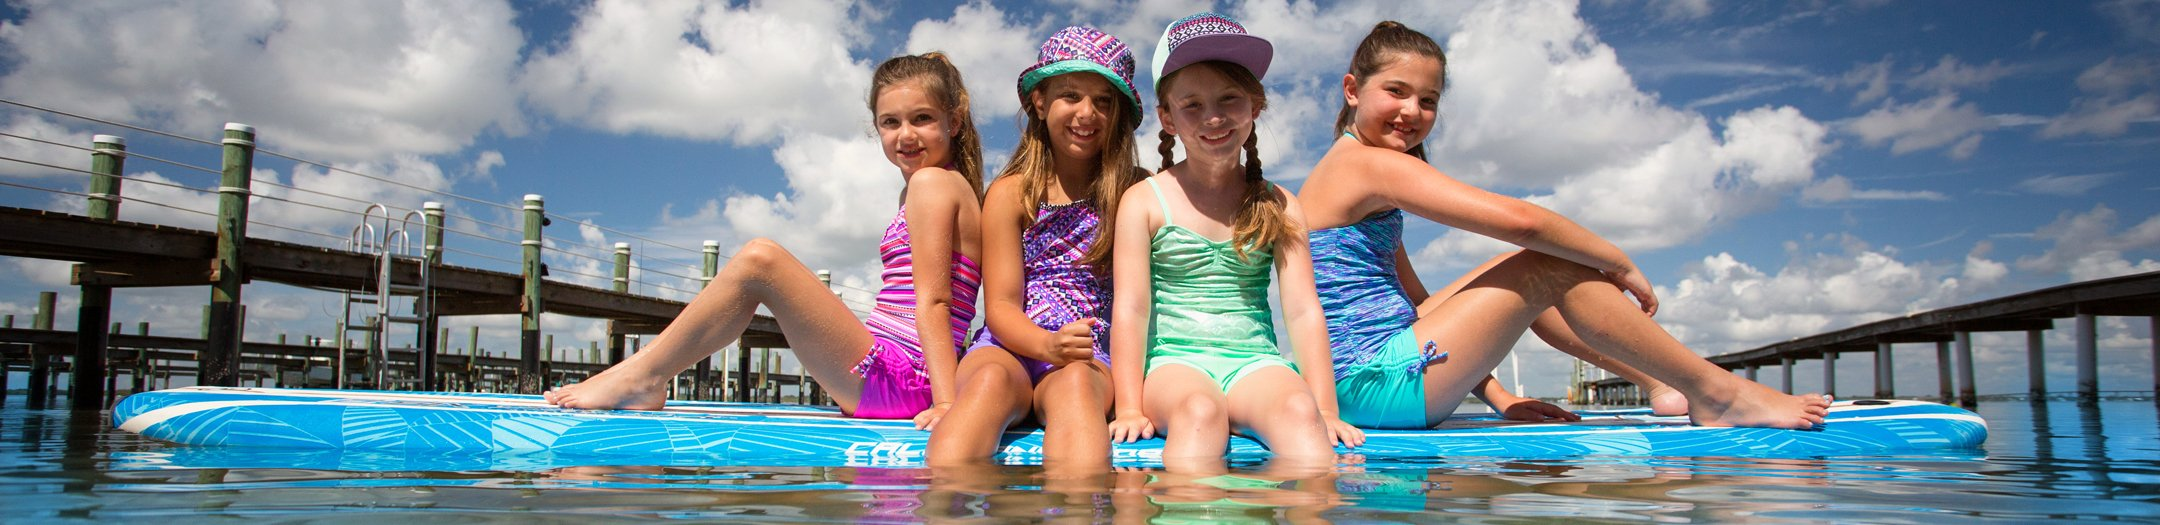 5fe21c2f8f Girls' Swim – Swimsuits – Free Country